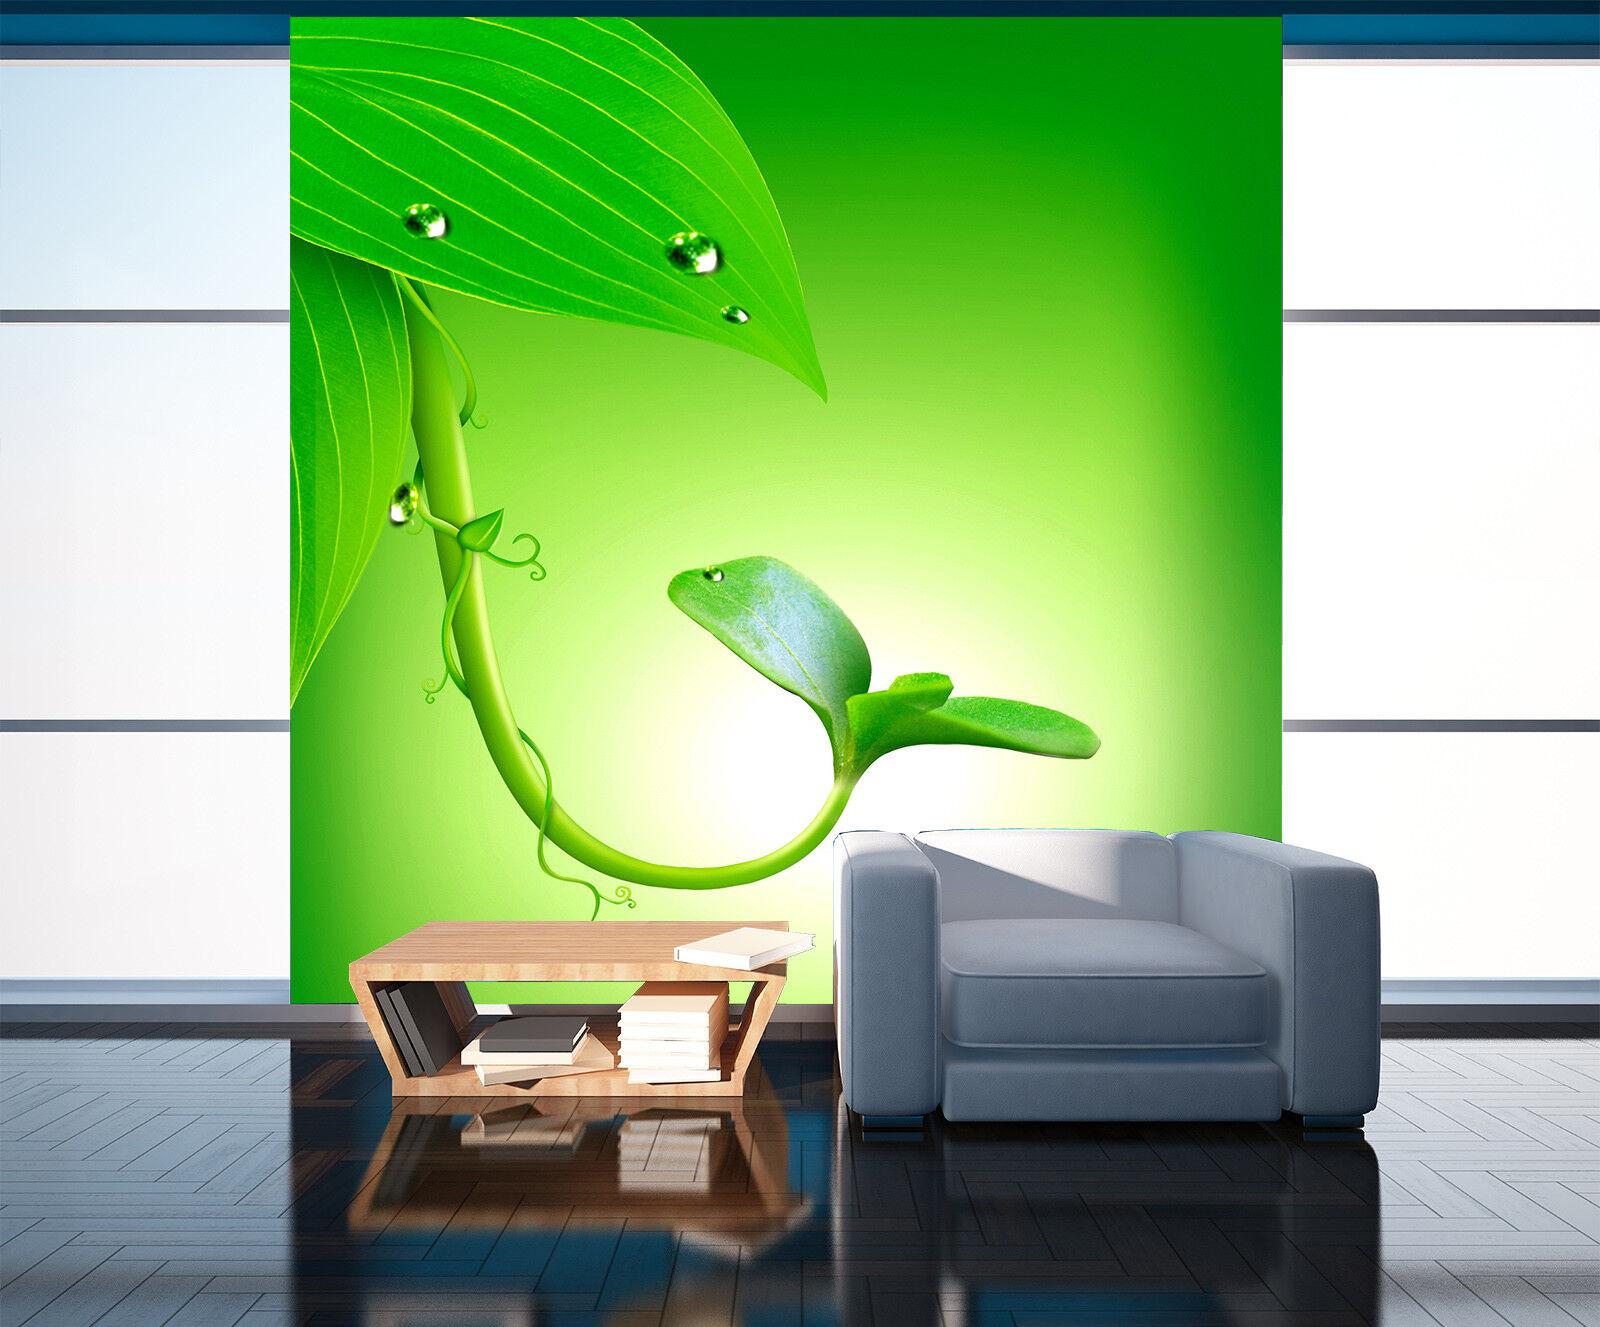 3D Green Bean Sprout 8 Wall Paper Murals Wall Print Wall Wallpaper Mural AU Kyra